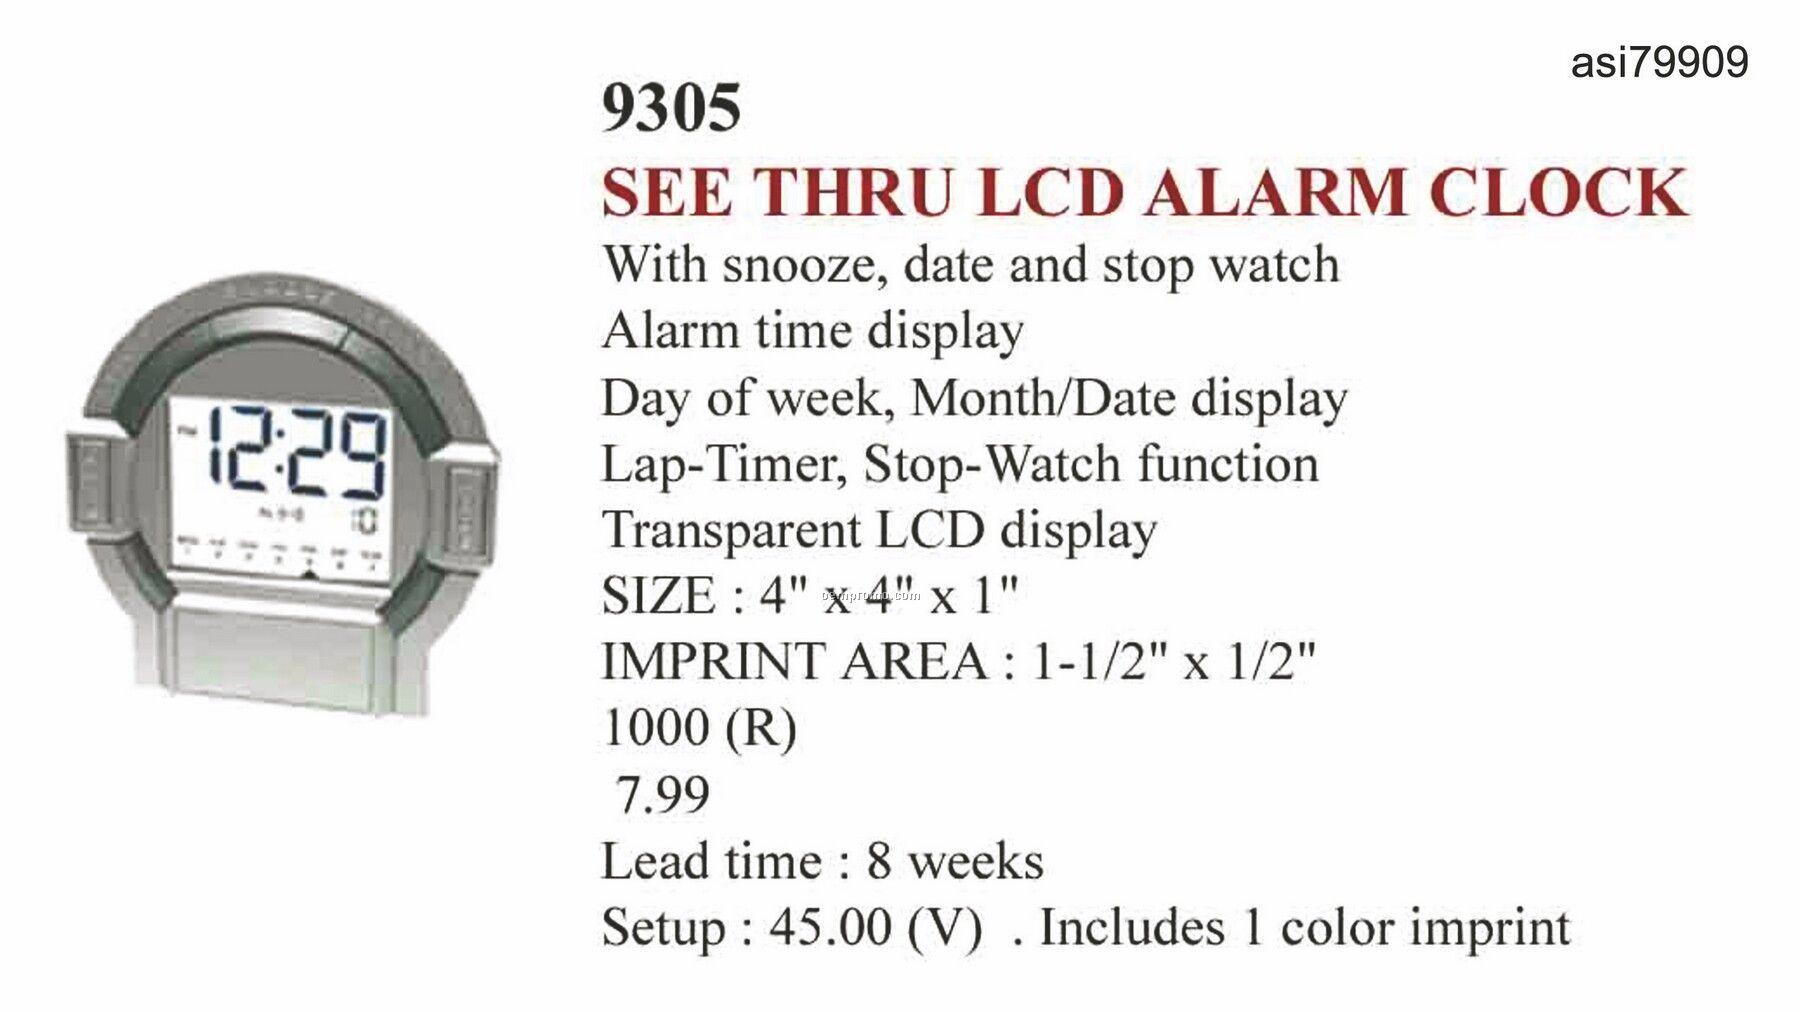 See Thru Lcd Alarm Clock